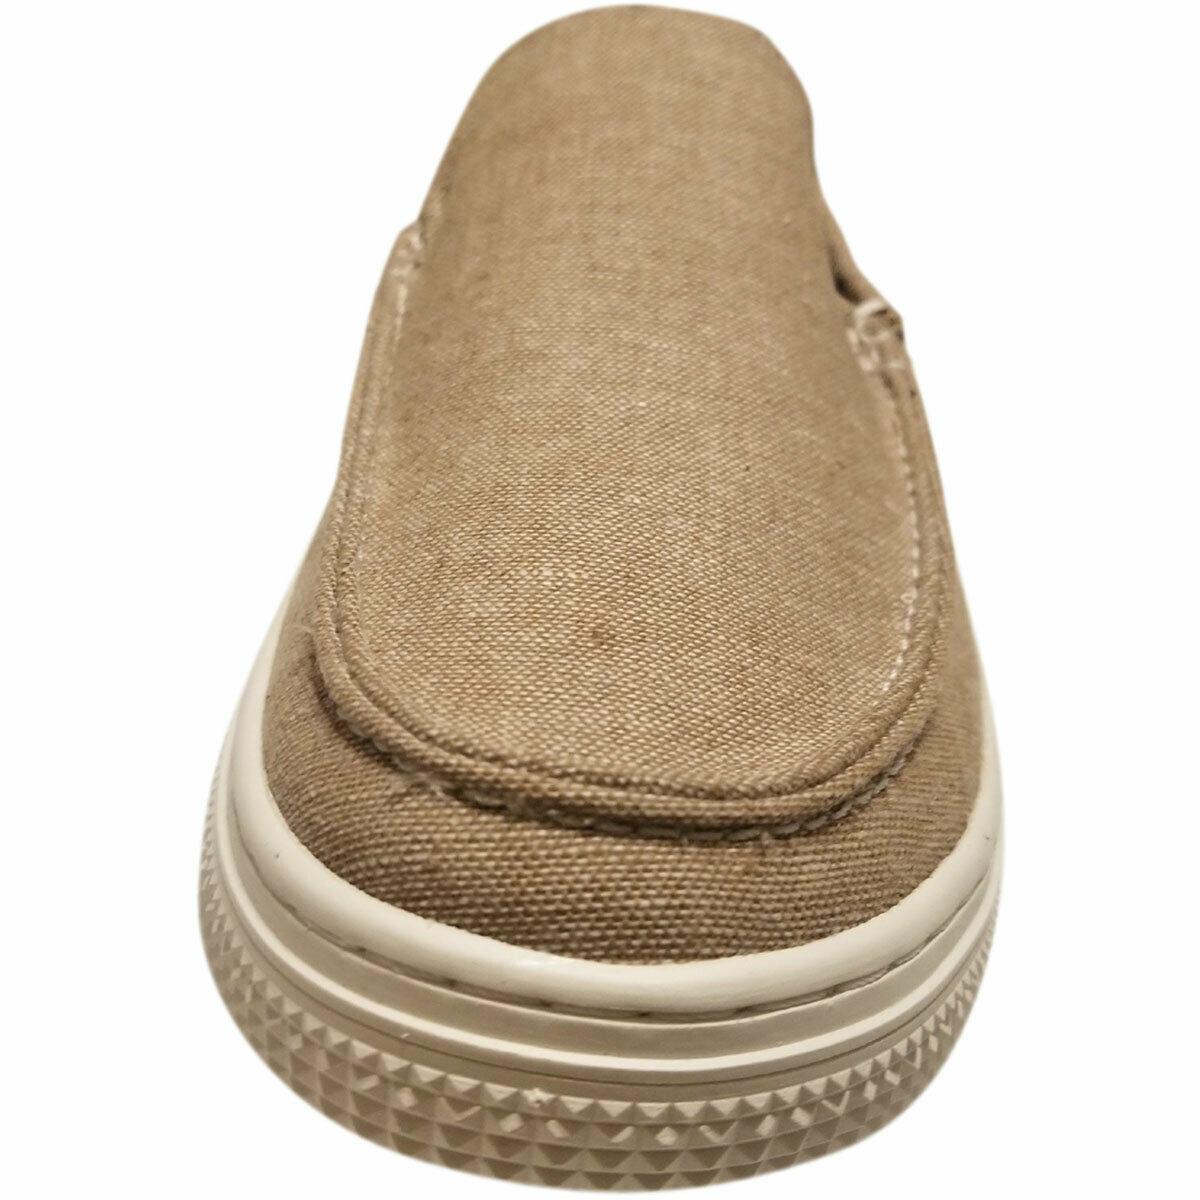 Kenneth Cole Reaction Men's Ankir Canvas Slip-on Boat Shoes Beige Sand 9.5 M ... image 2